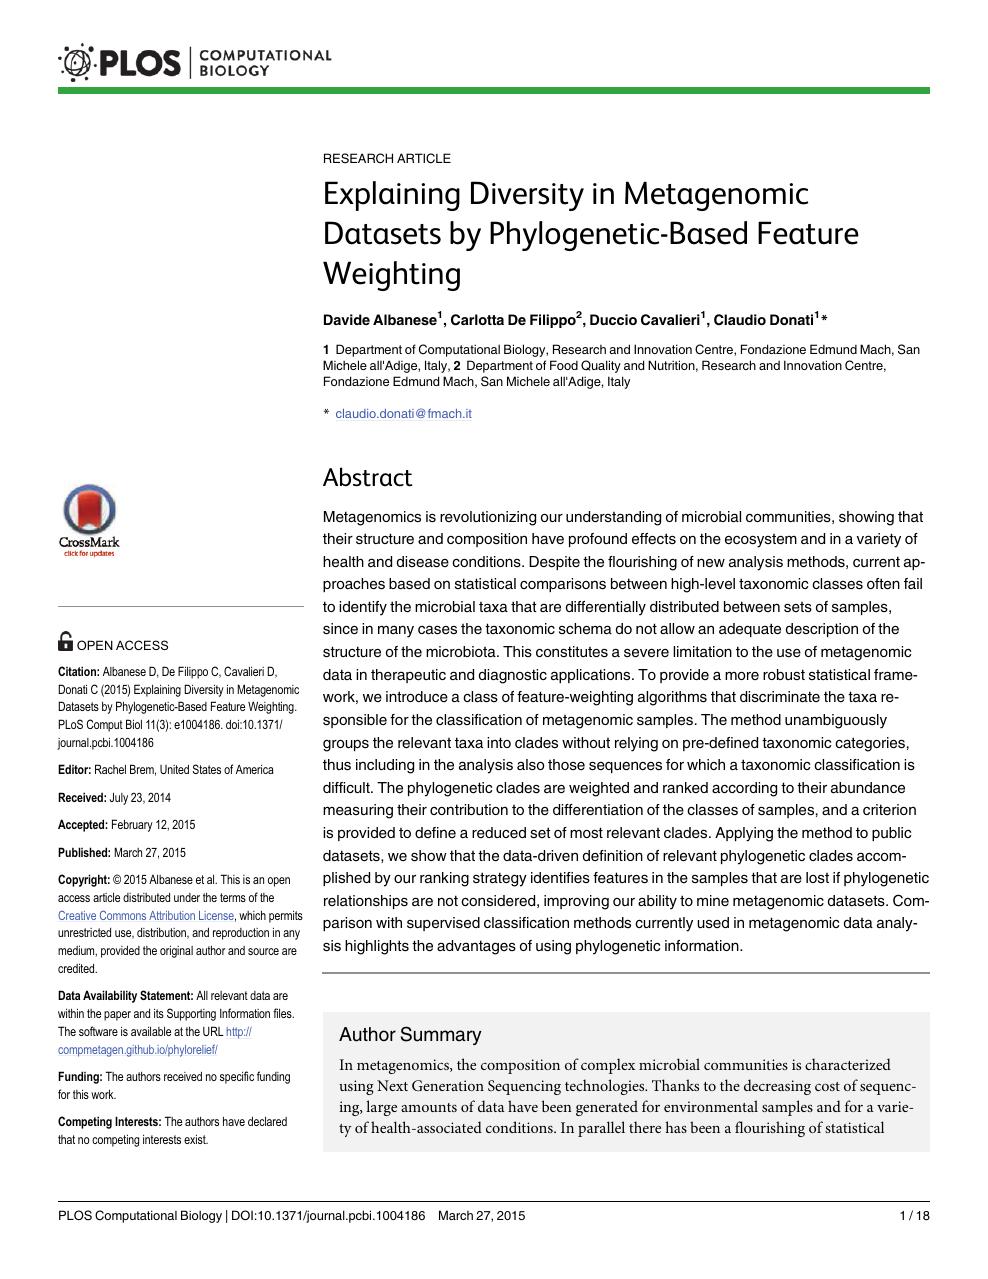 Explaining Diversity in Metagenomic Datasets by Phylogenetic